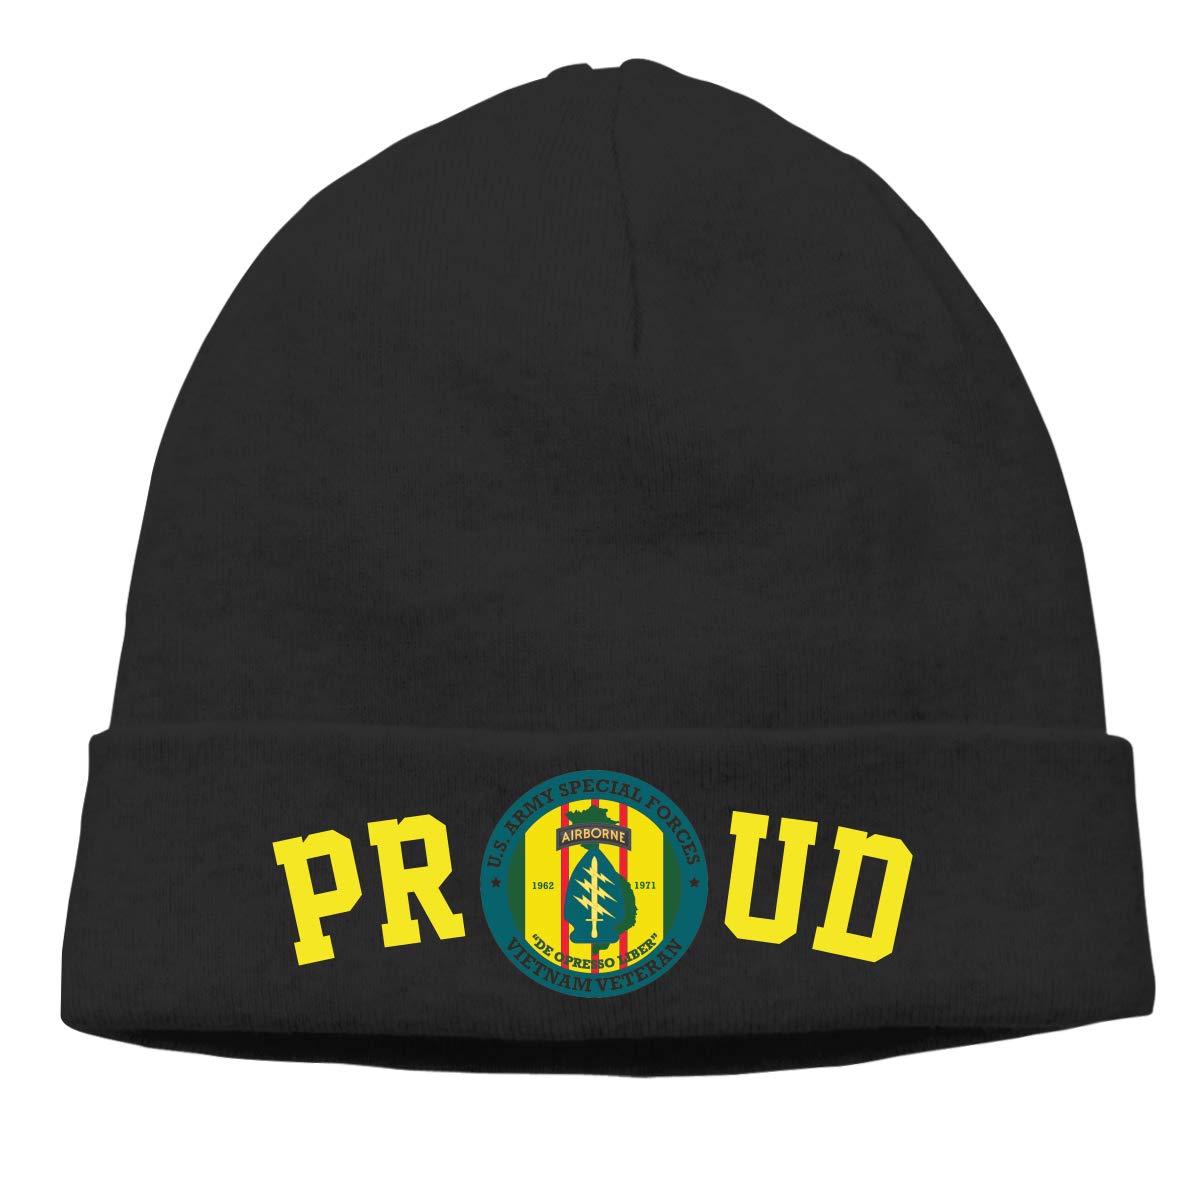 FORDSAN CP Proud Special Forces Vietnam Veteran Mens Beanie Cap Skull Cap Winter Warm Knitting Hats.